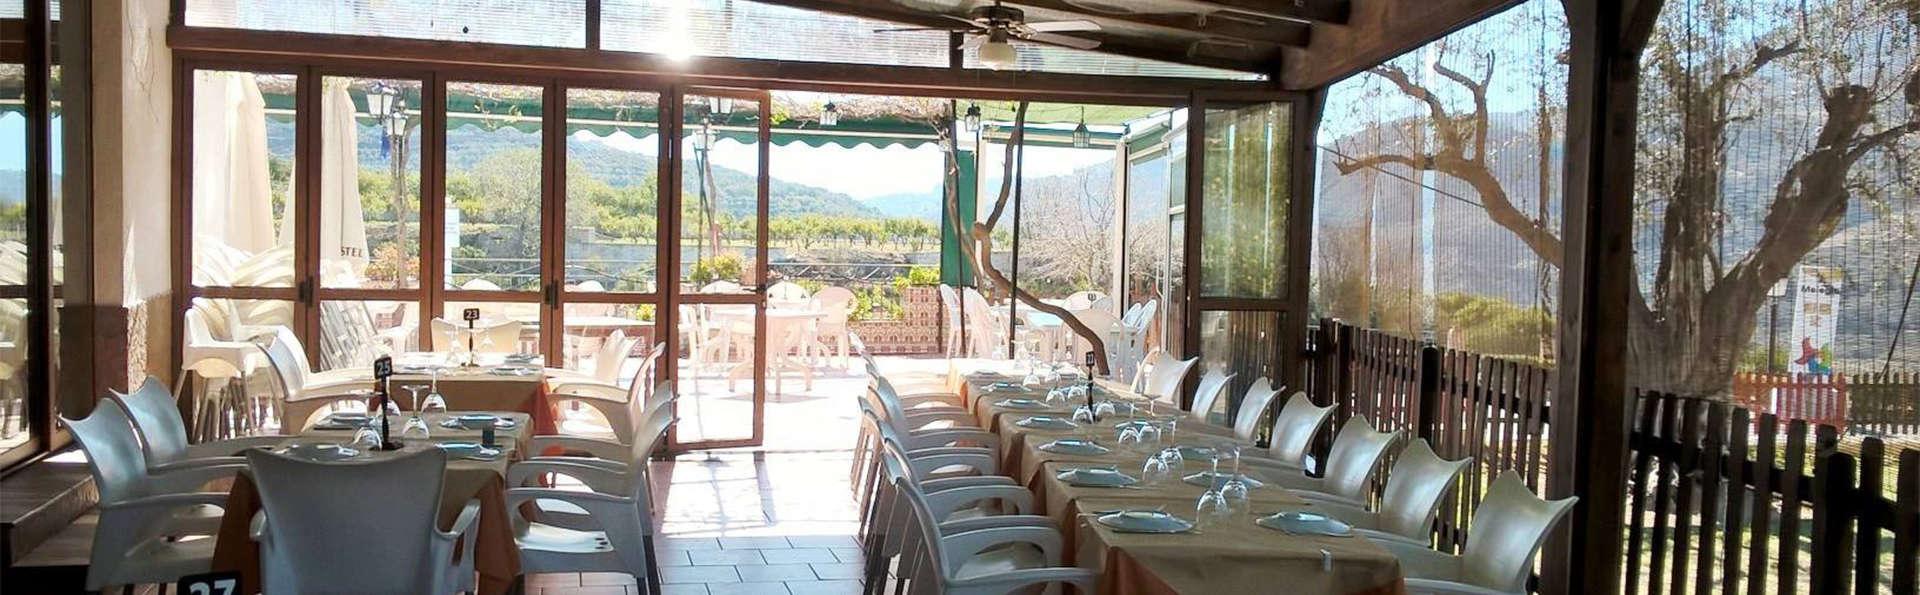 Complejo Rural Los Naranjos - EDIT_rest3.jpg